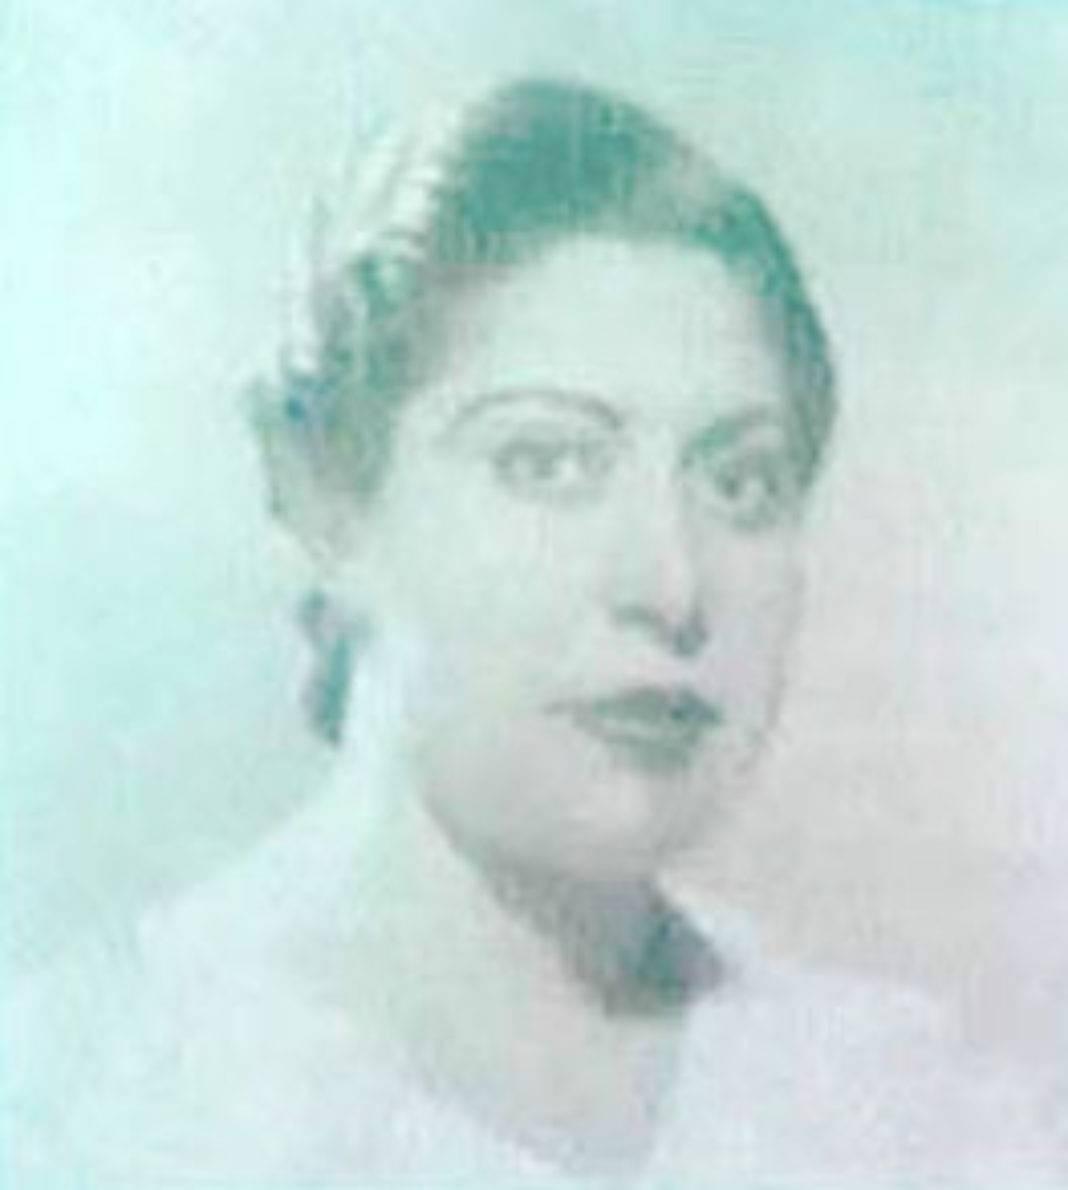 Elvira fernández almoguera casas 1068x1190 - Homenaje a la pionera Elvira Fernández-Almoguera Casas